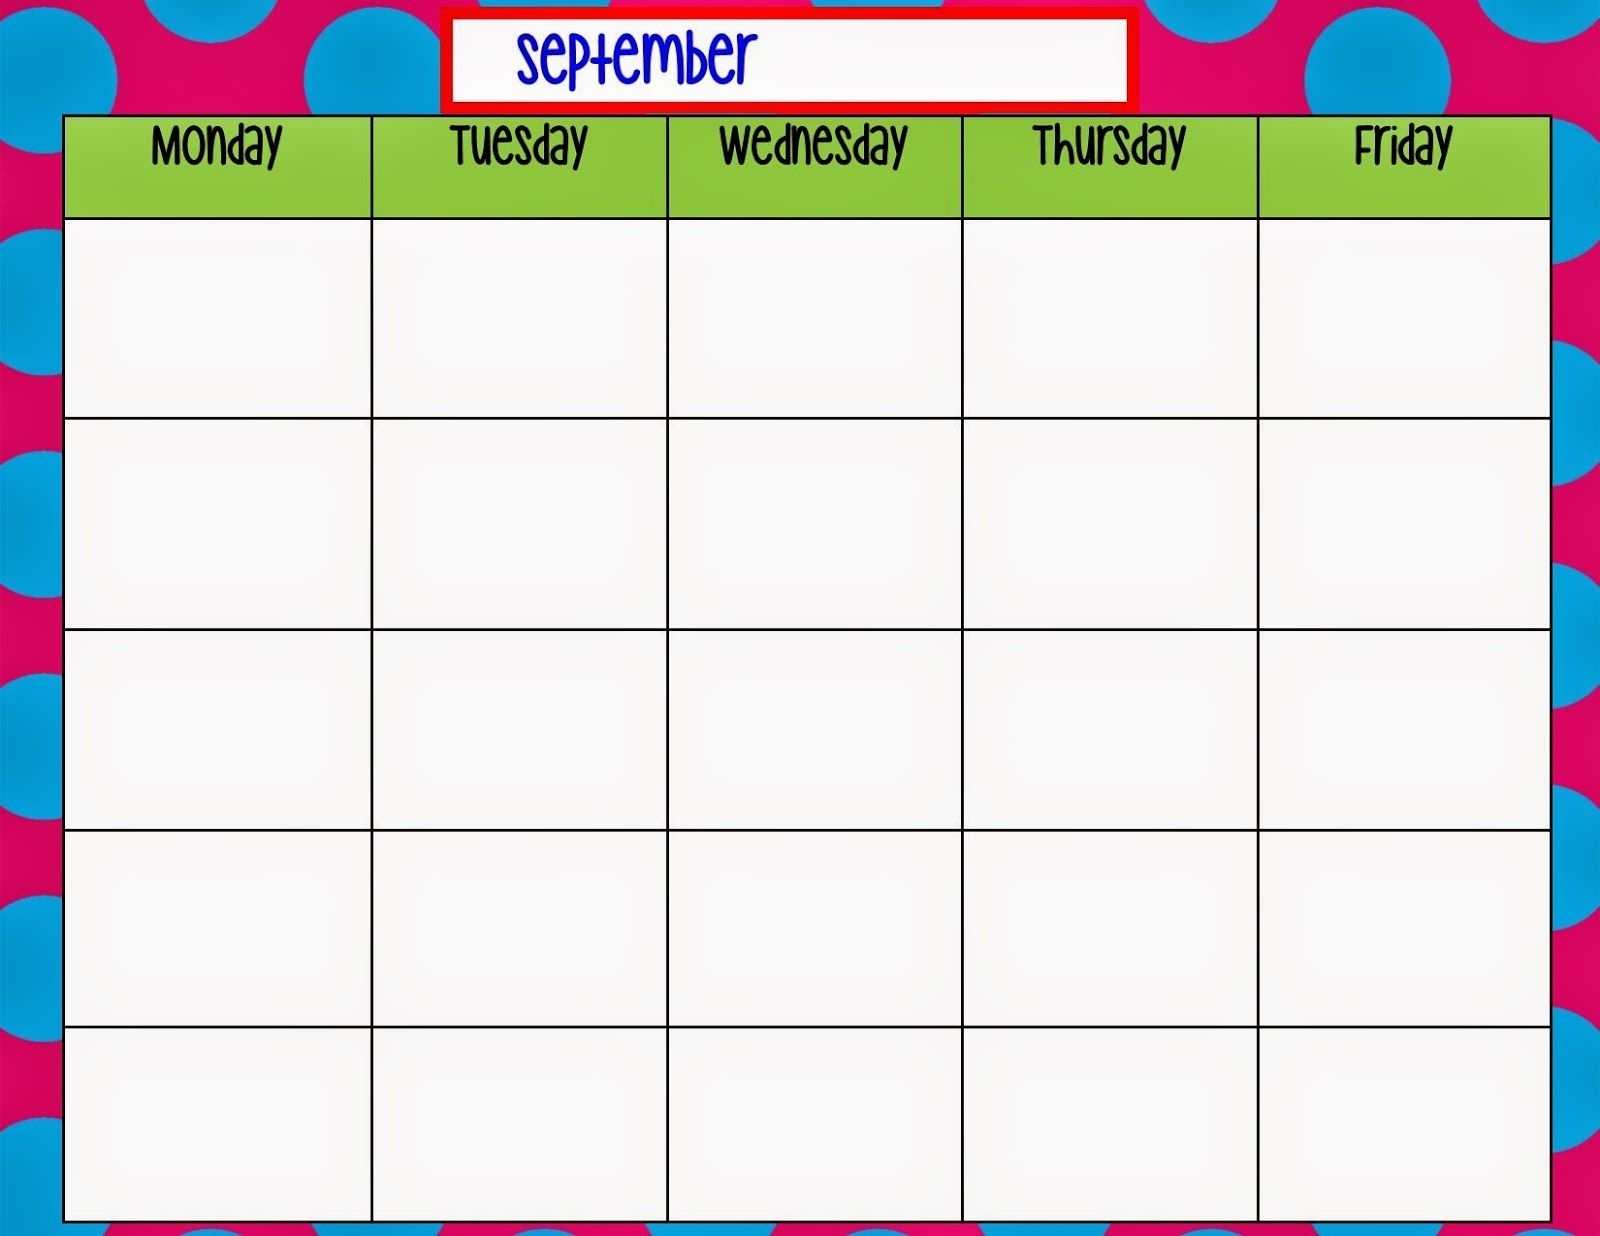 Monday Through Friday Calendar Template | Preschool | Printable within Blank Weekly Monday Through Friday Calendar Template